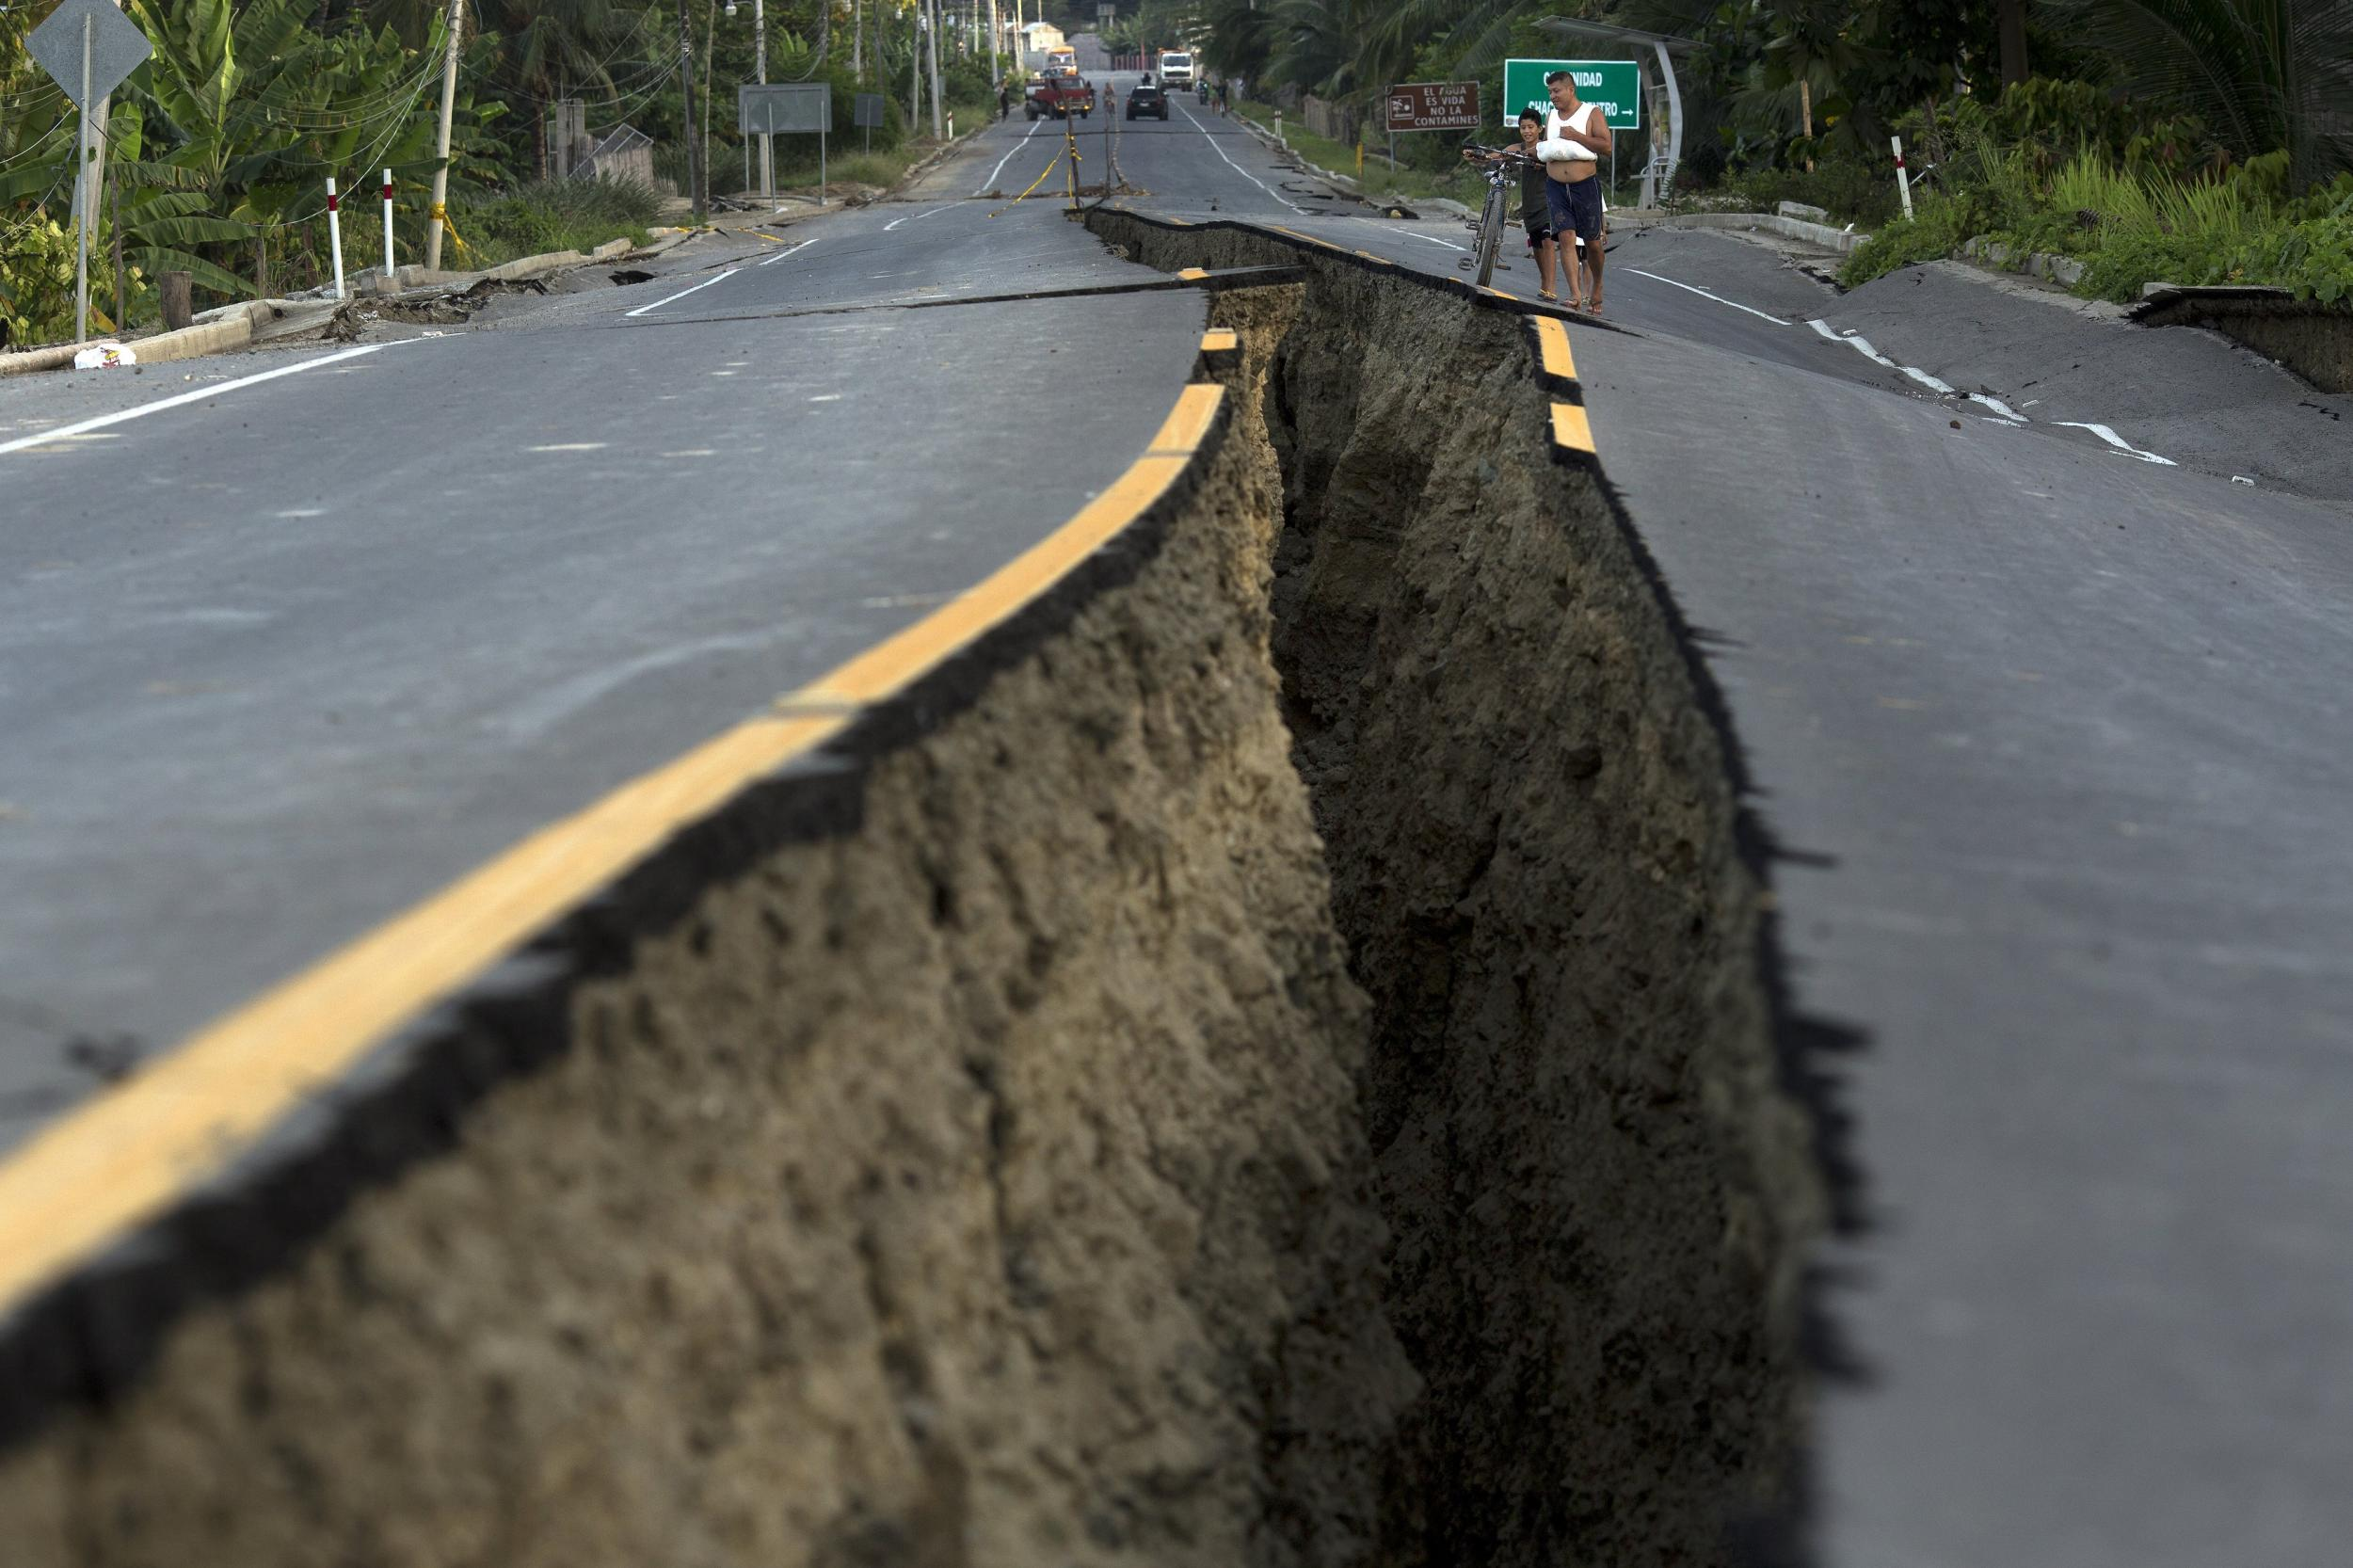 earthquake today - photo #5